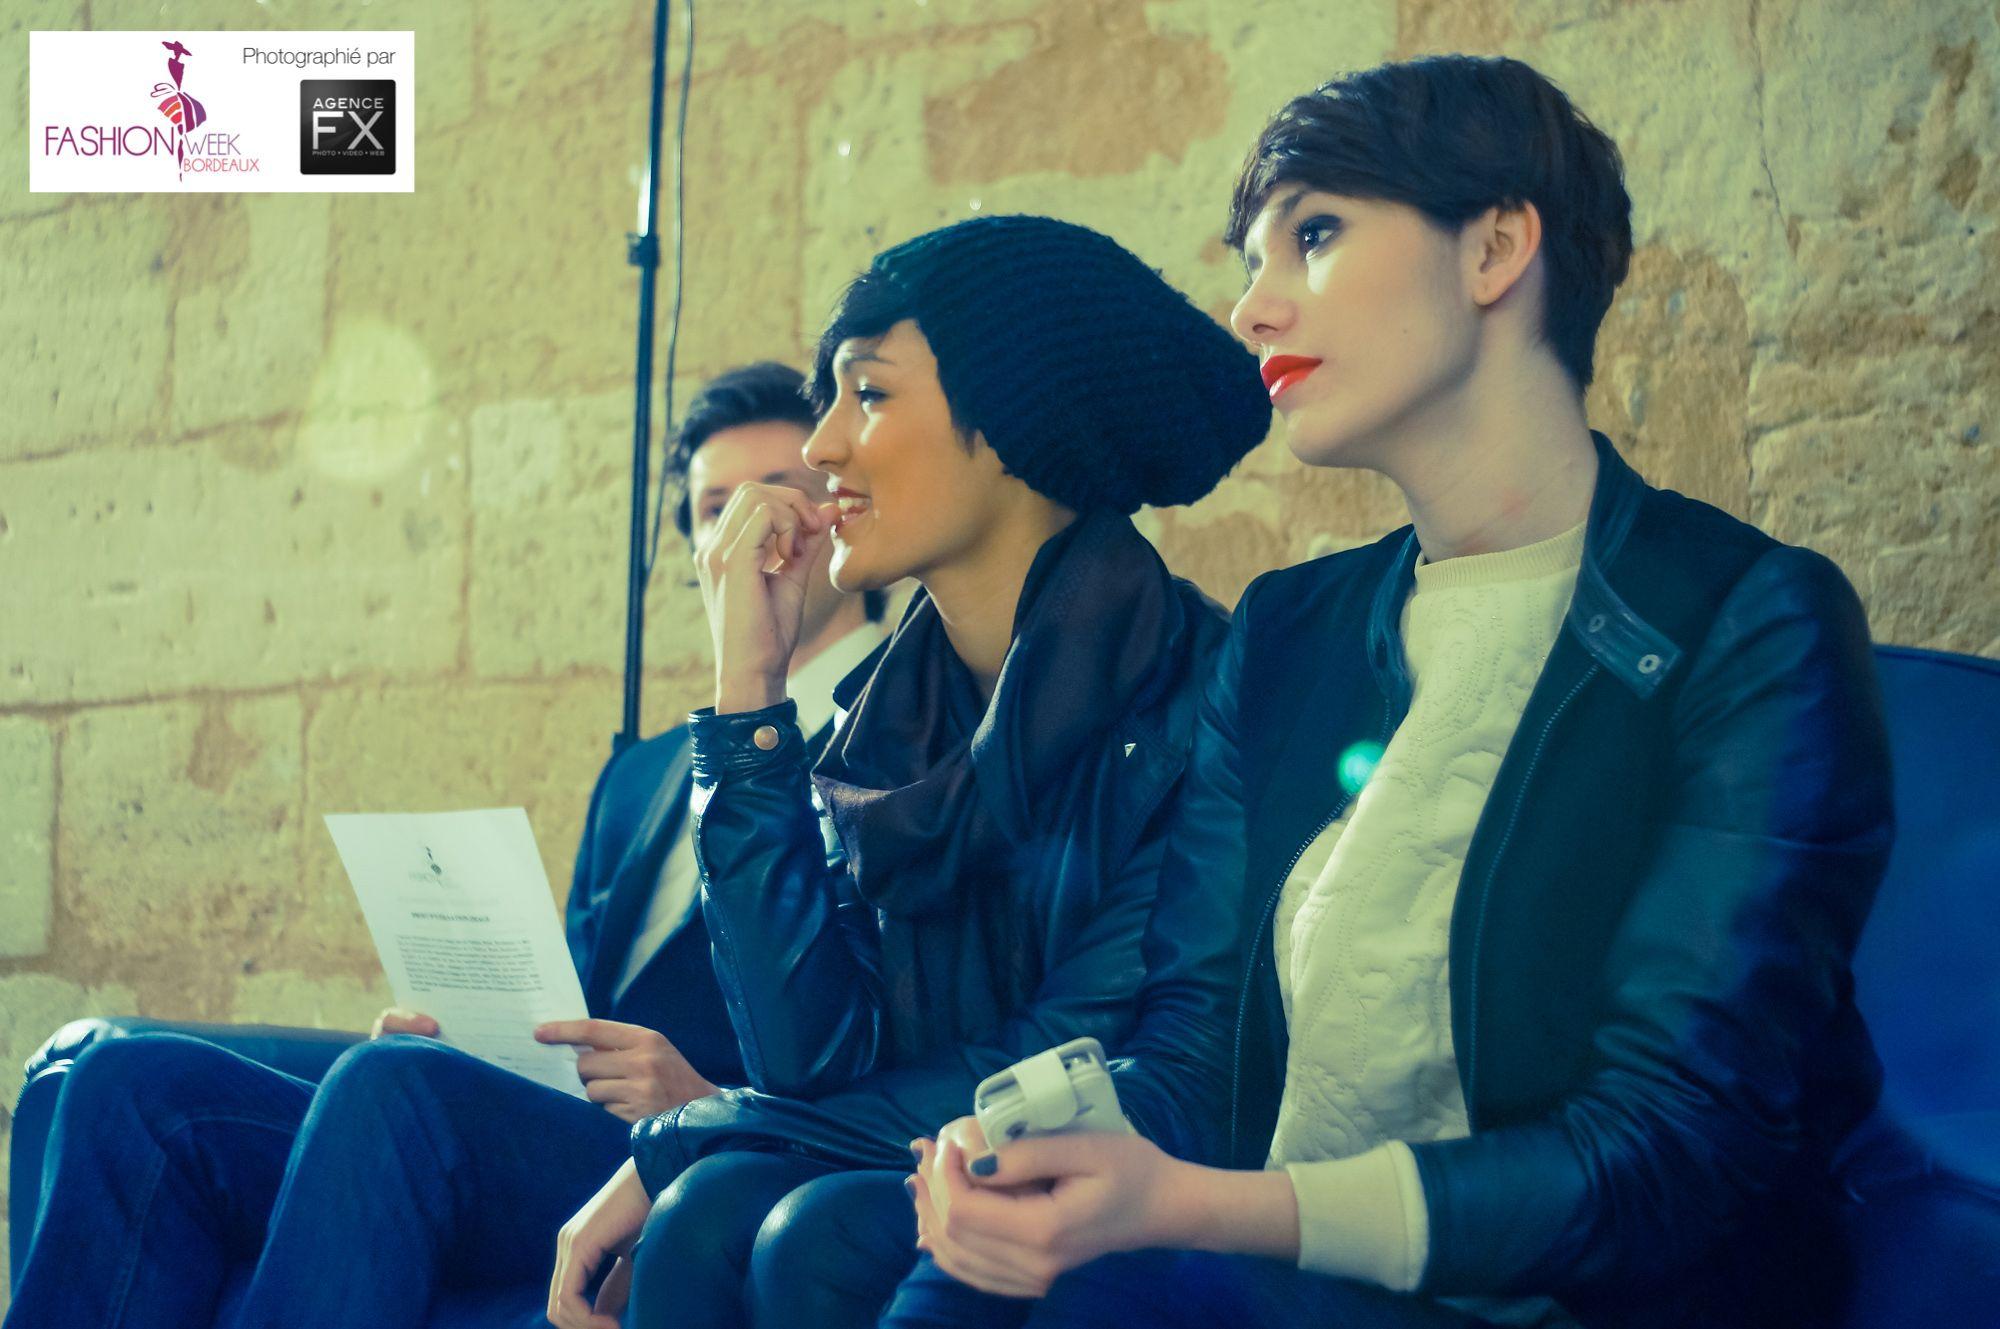 Fashion Week Bordeaux / Agence FX